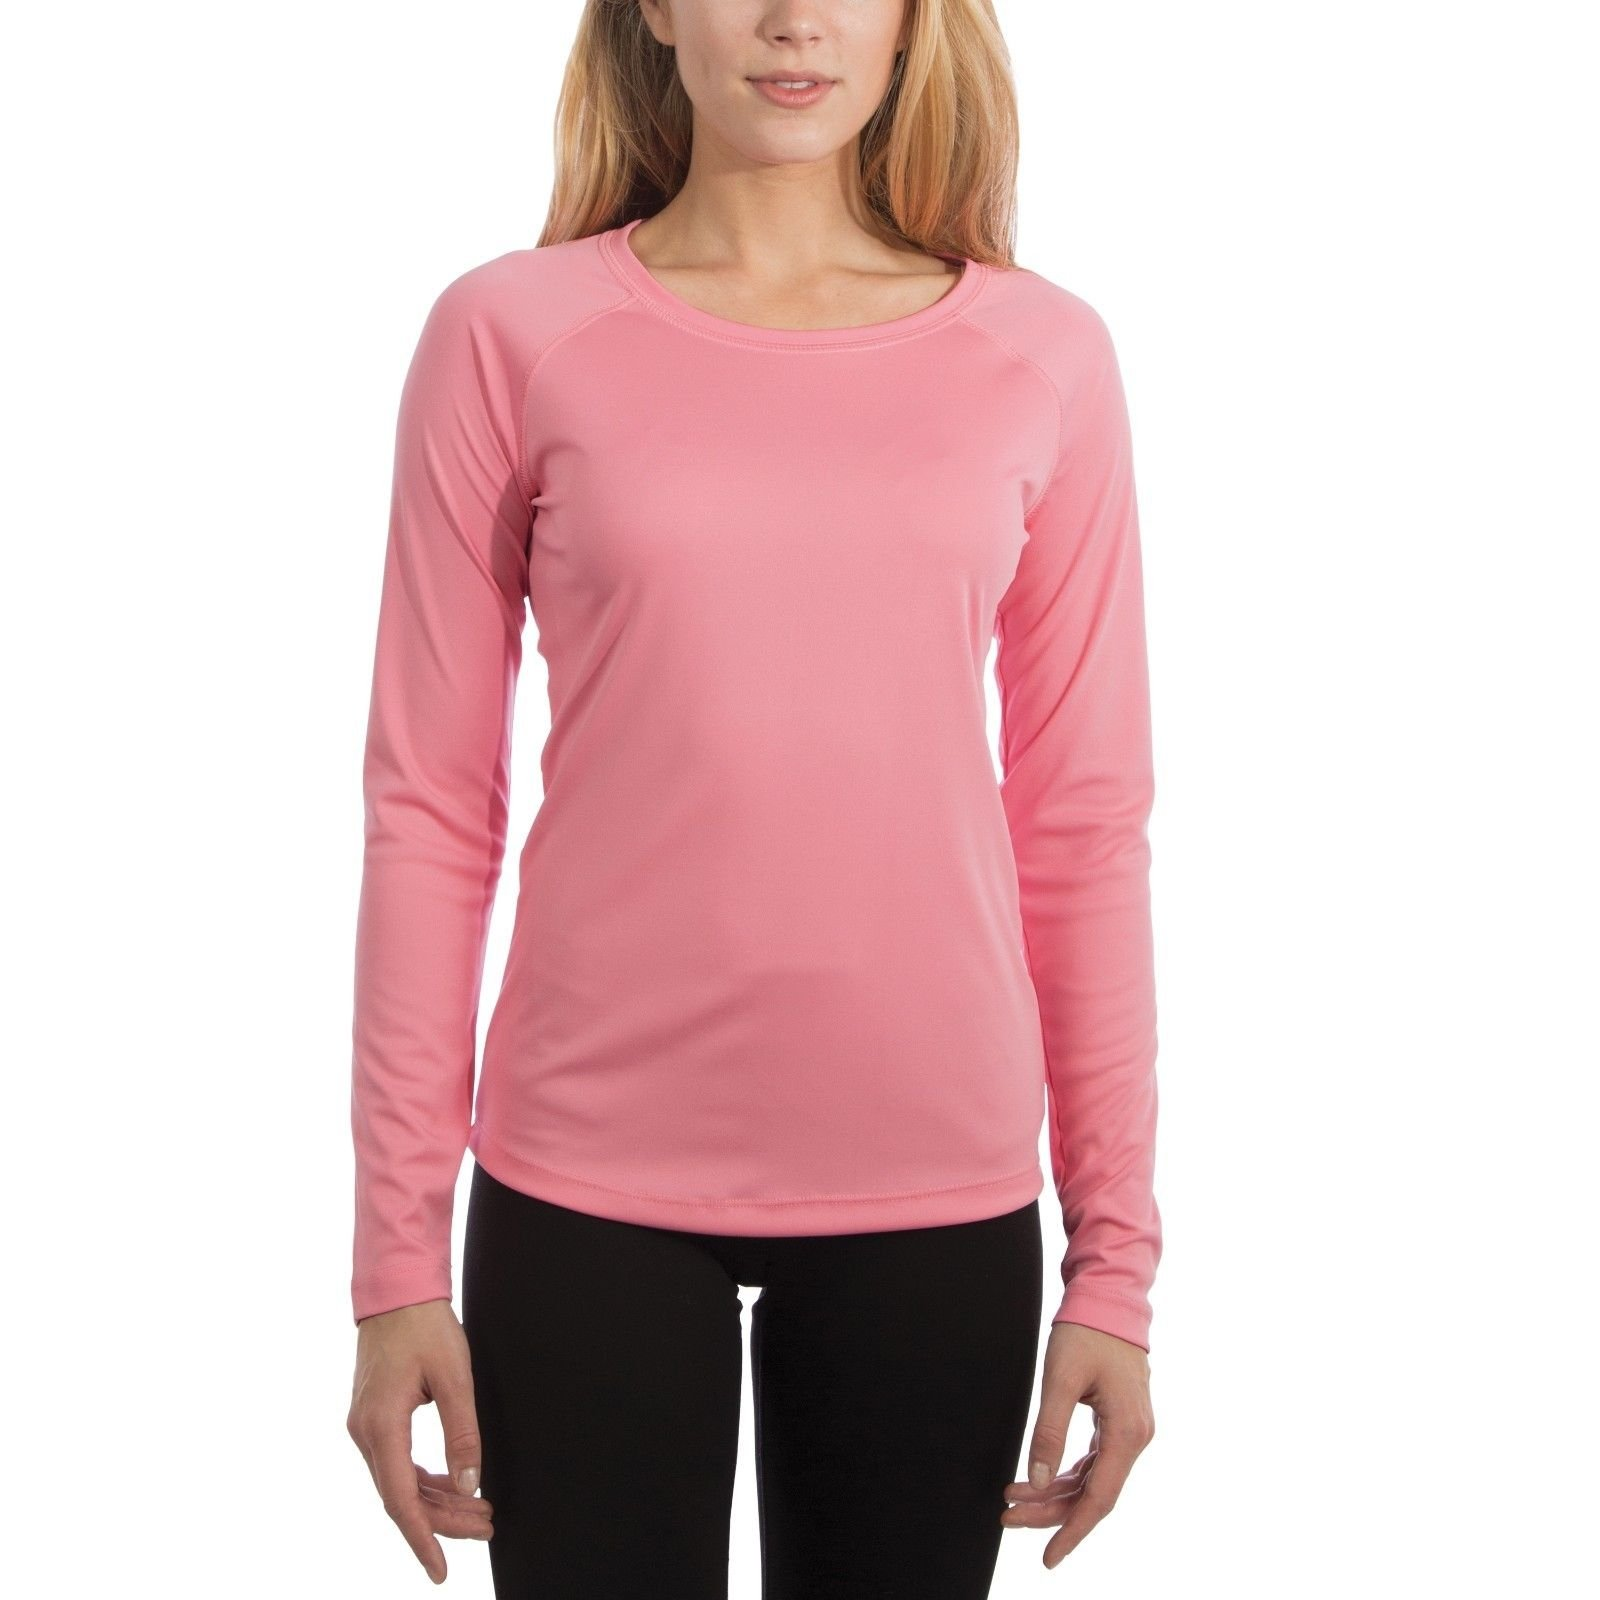 vapor apparel women 39 s upf 50 uv sun protection long